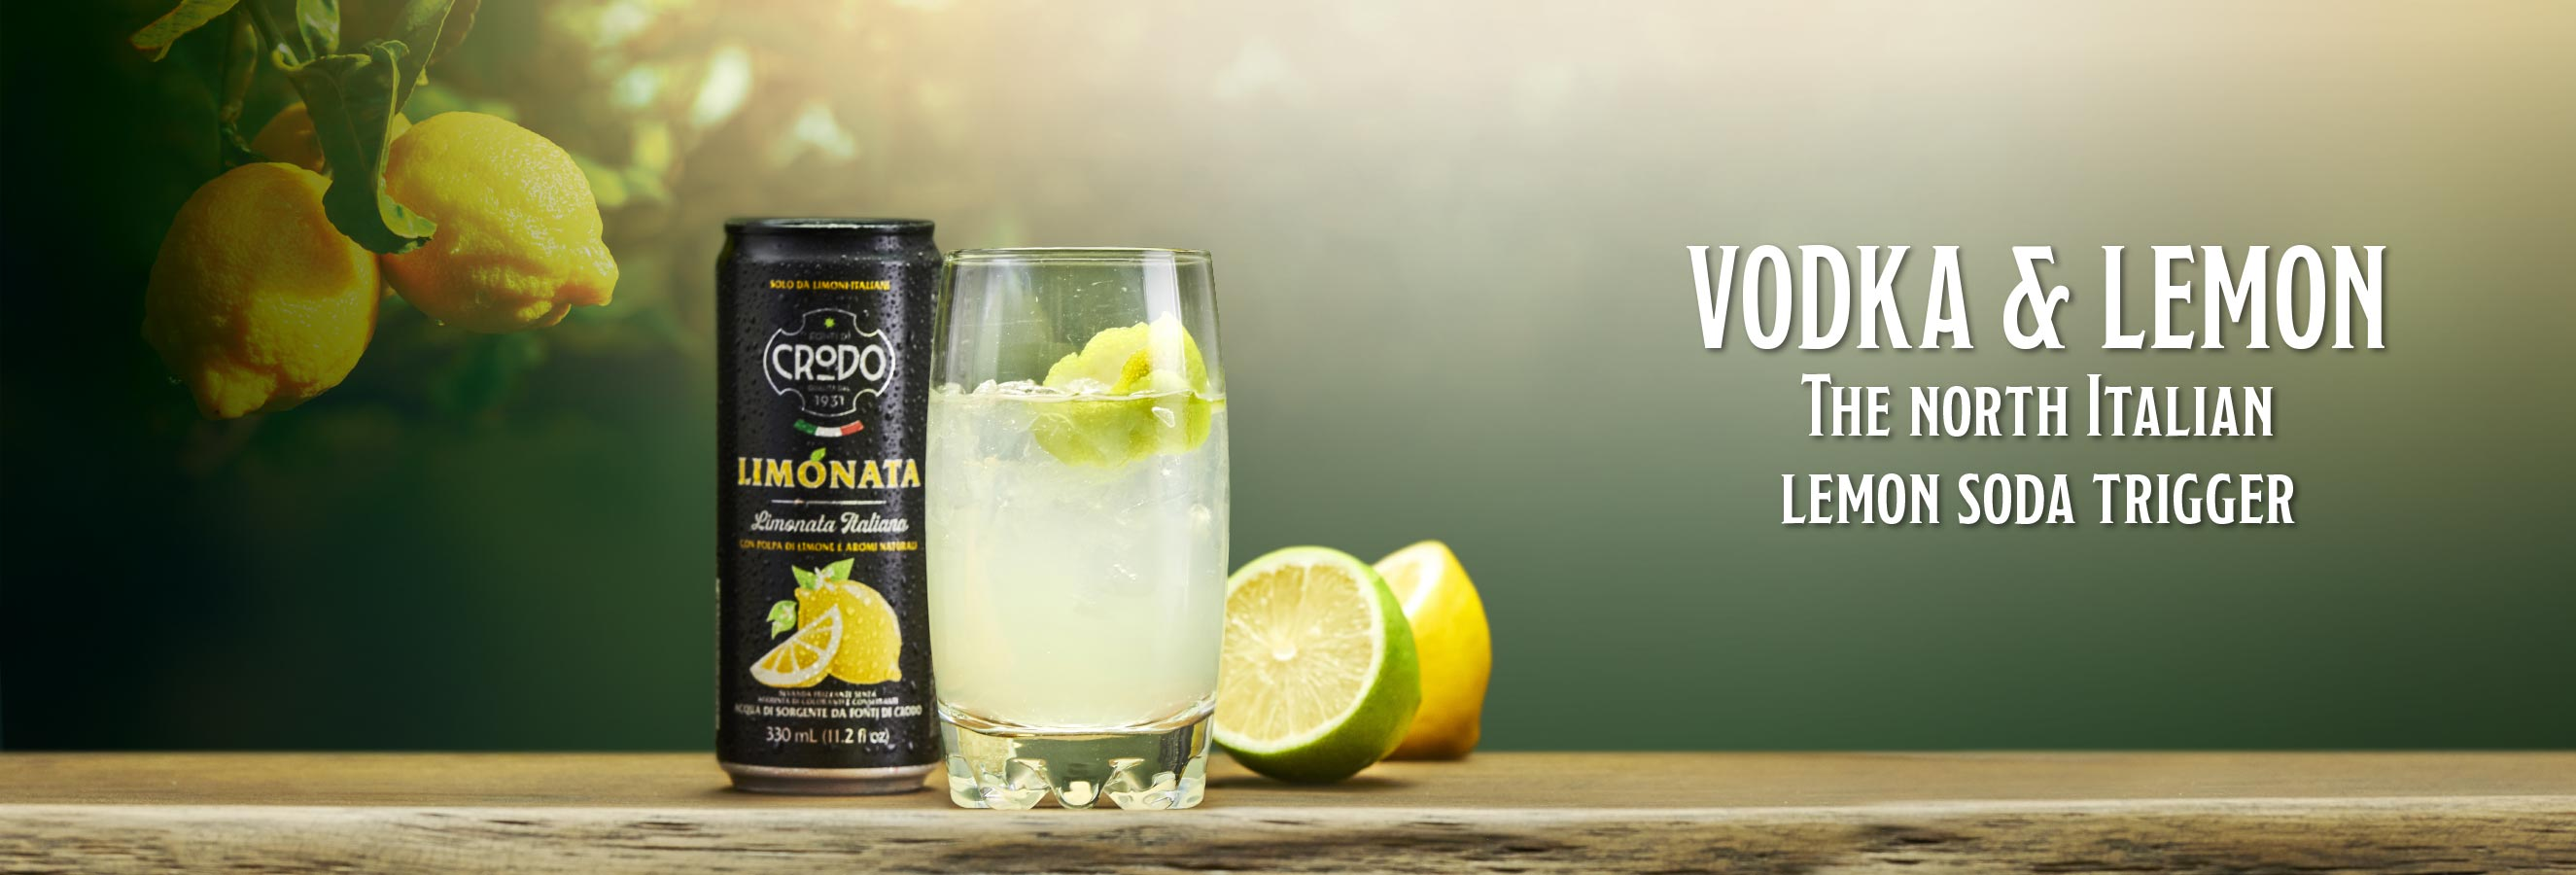 FONTIDICRODO-Web-CocktailsImage-2650x900-VodkaLemon